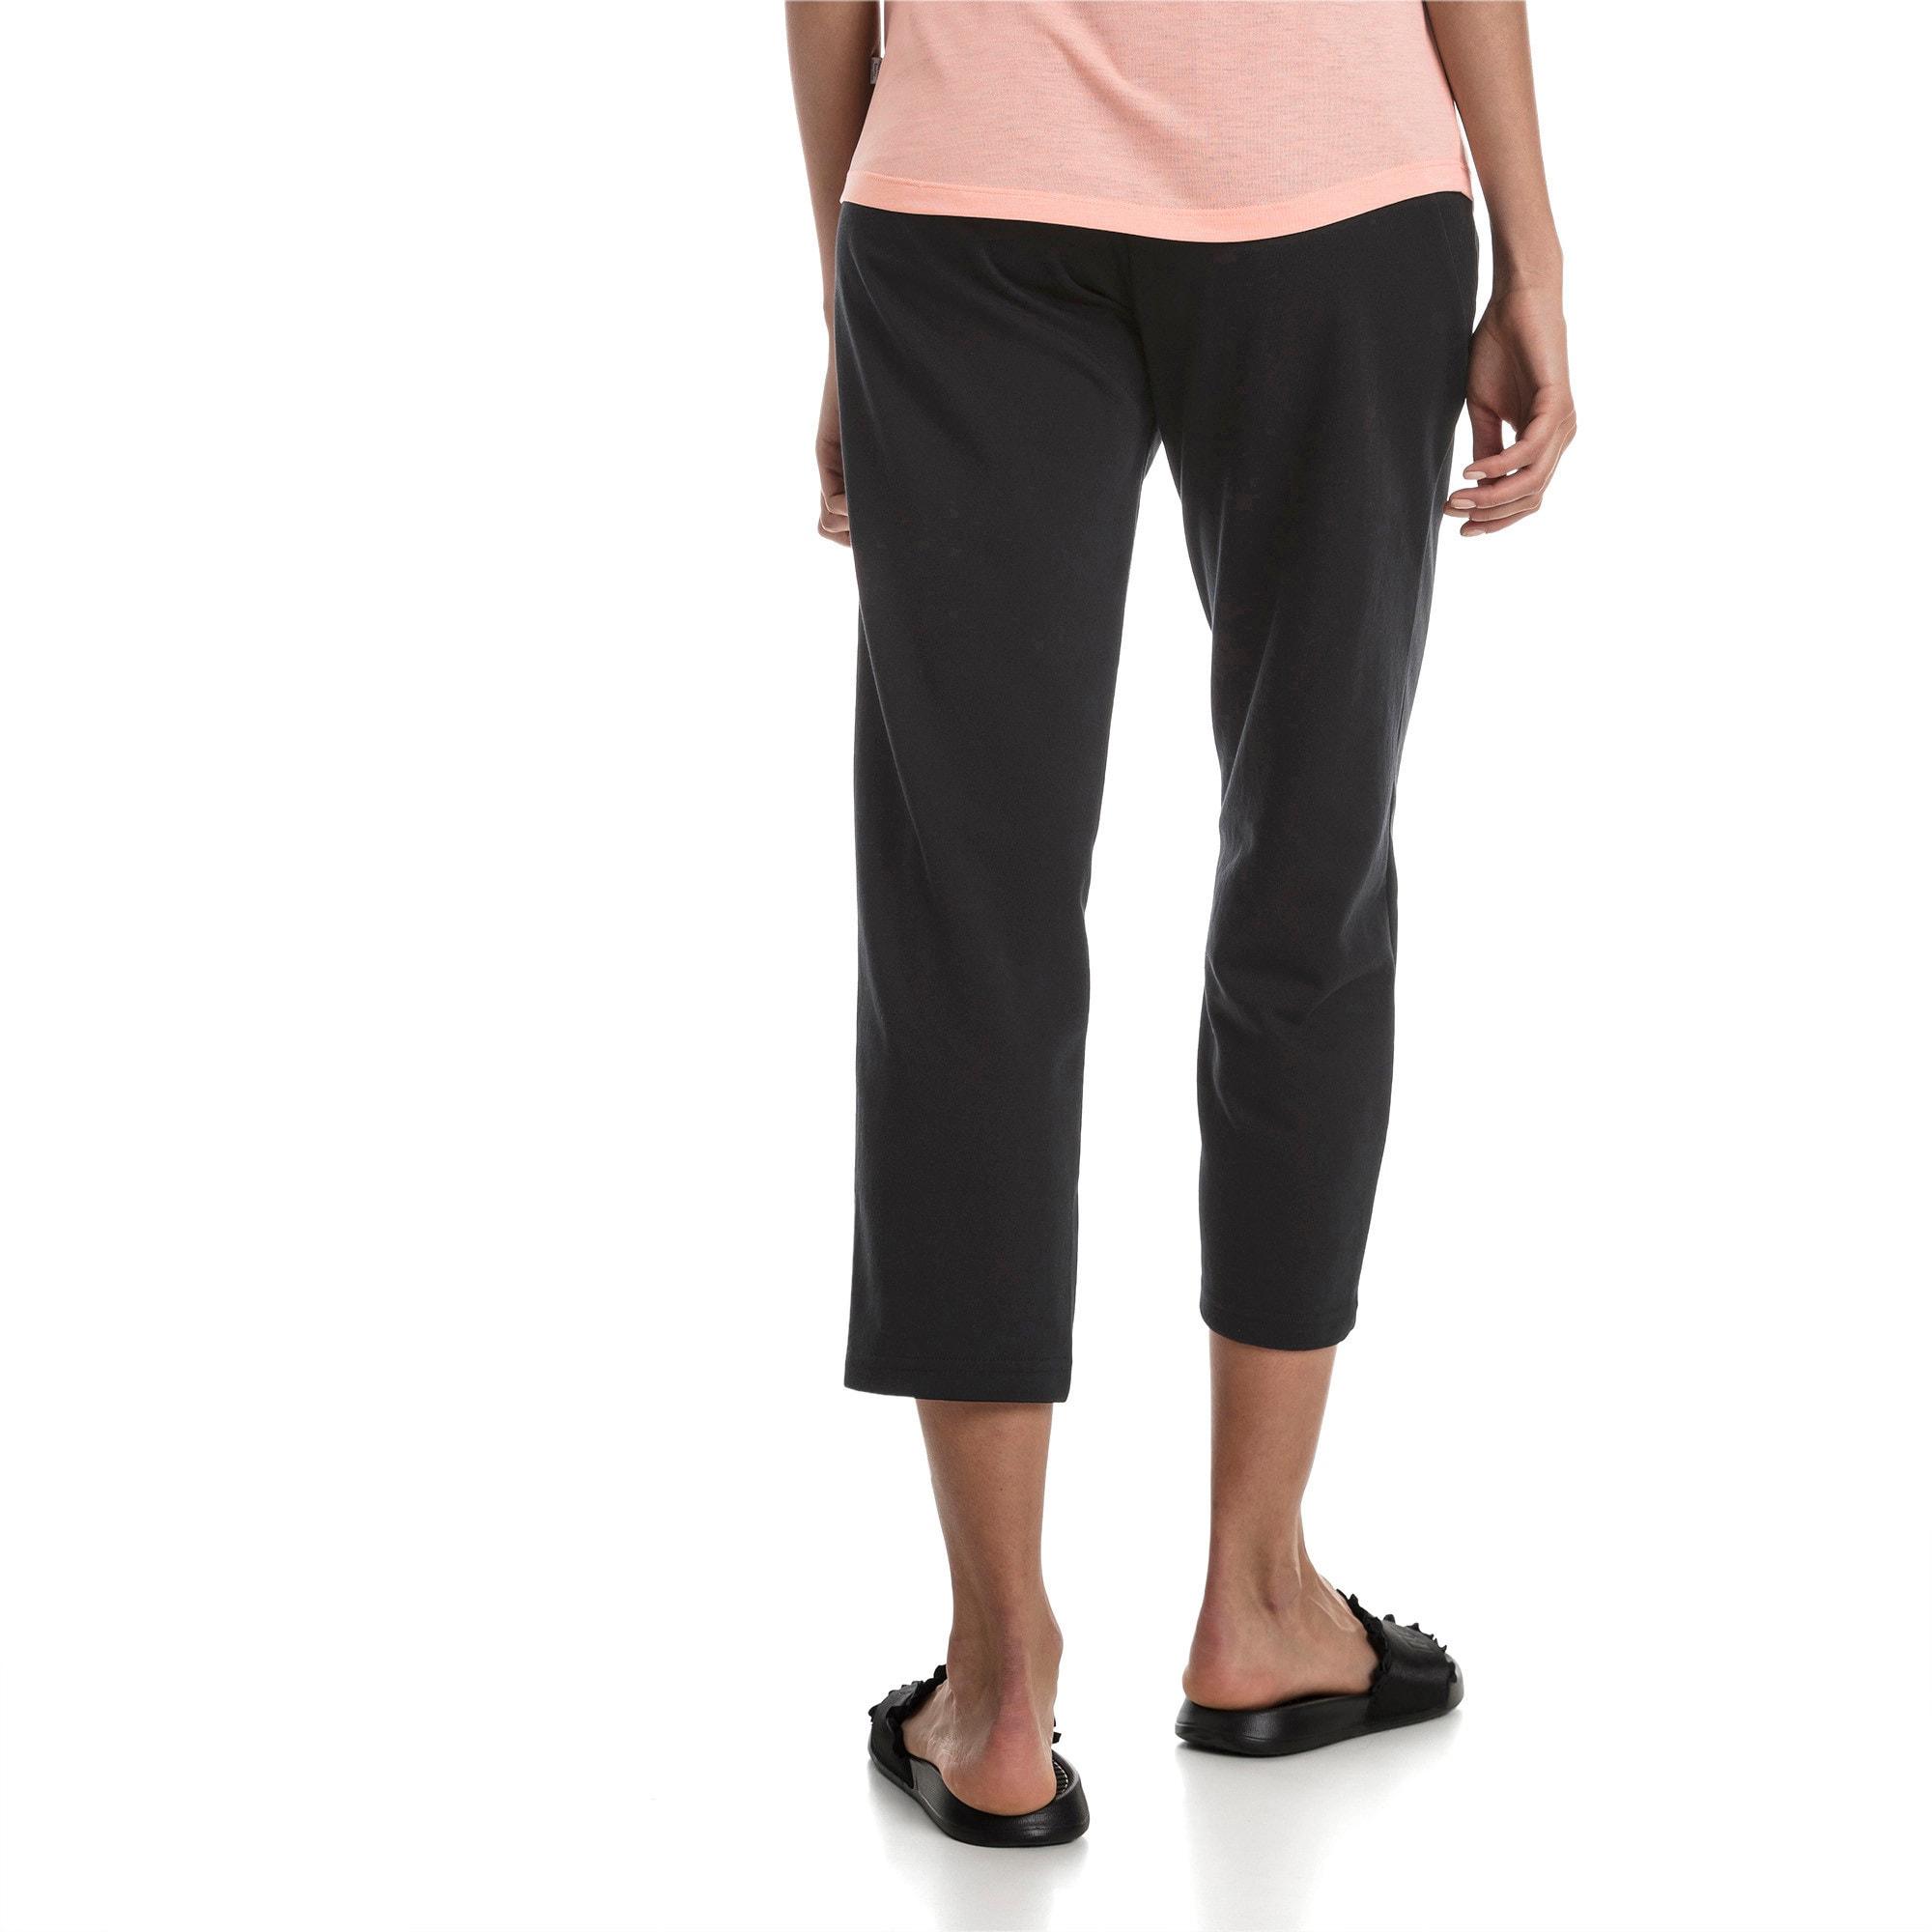 Thumbnail 2 of Fusion Women's Sweatpants, Cotton Black, medium